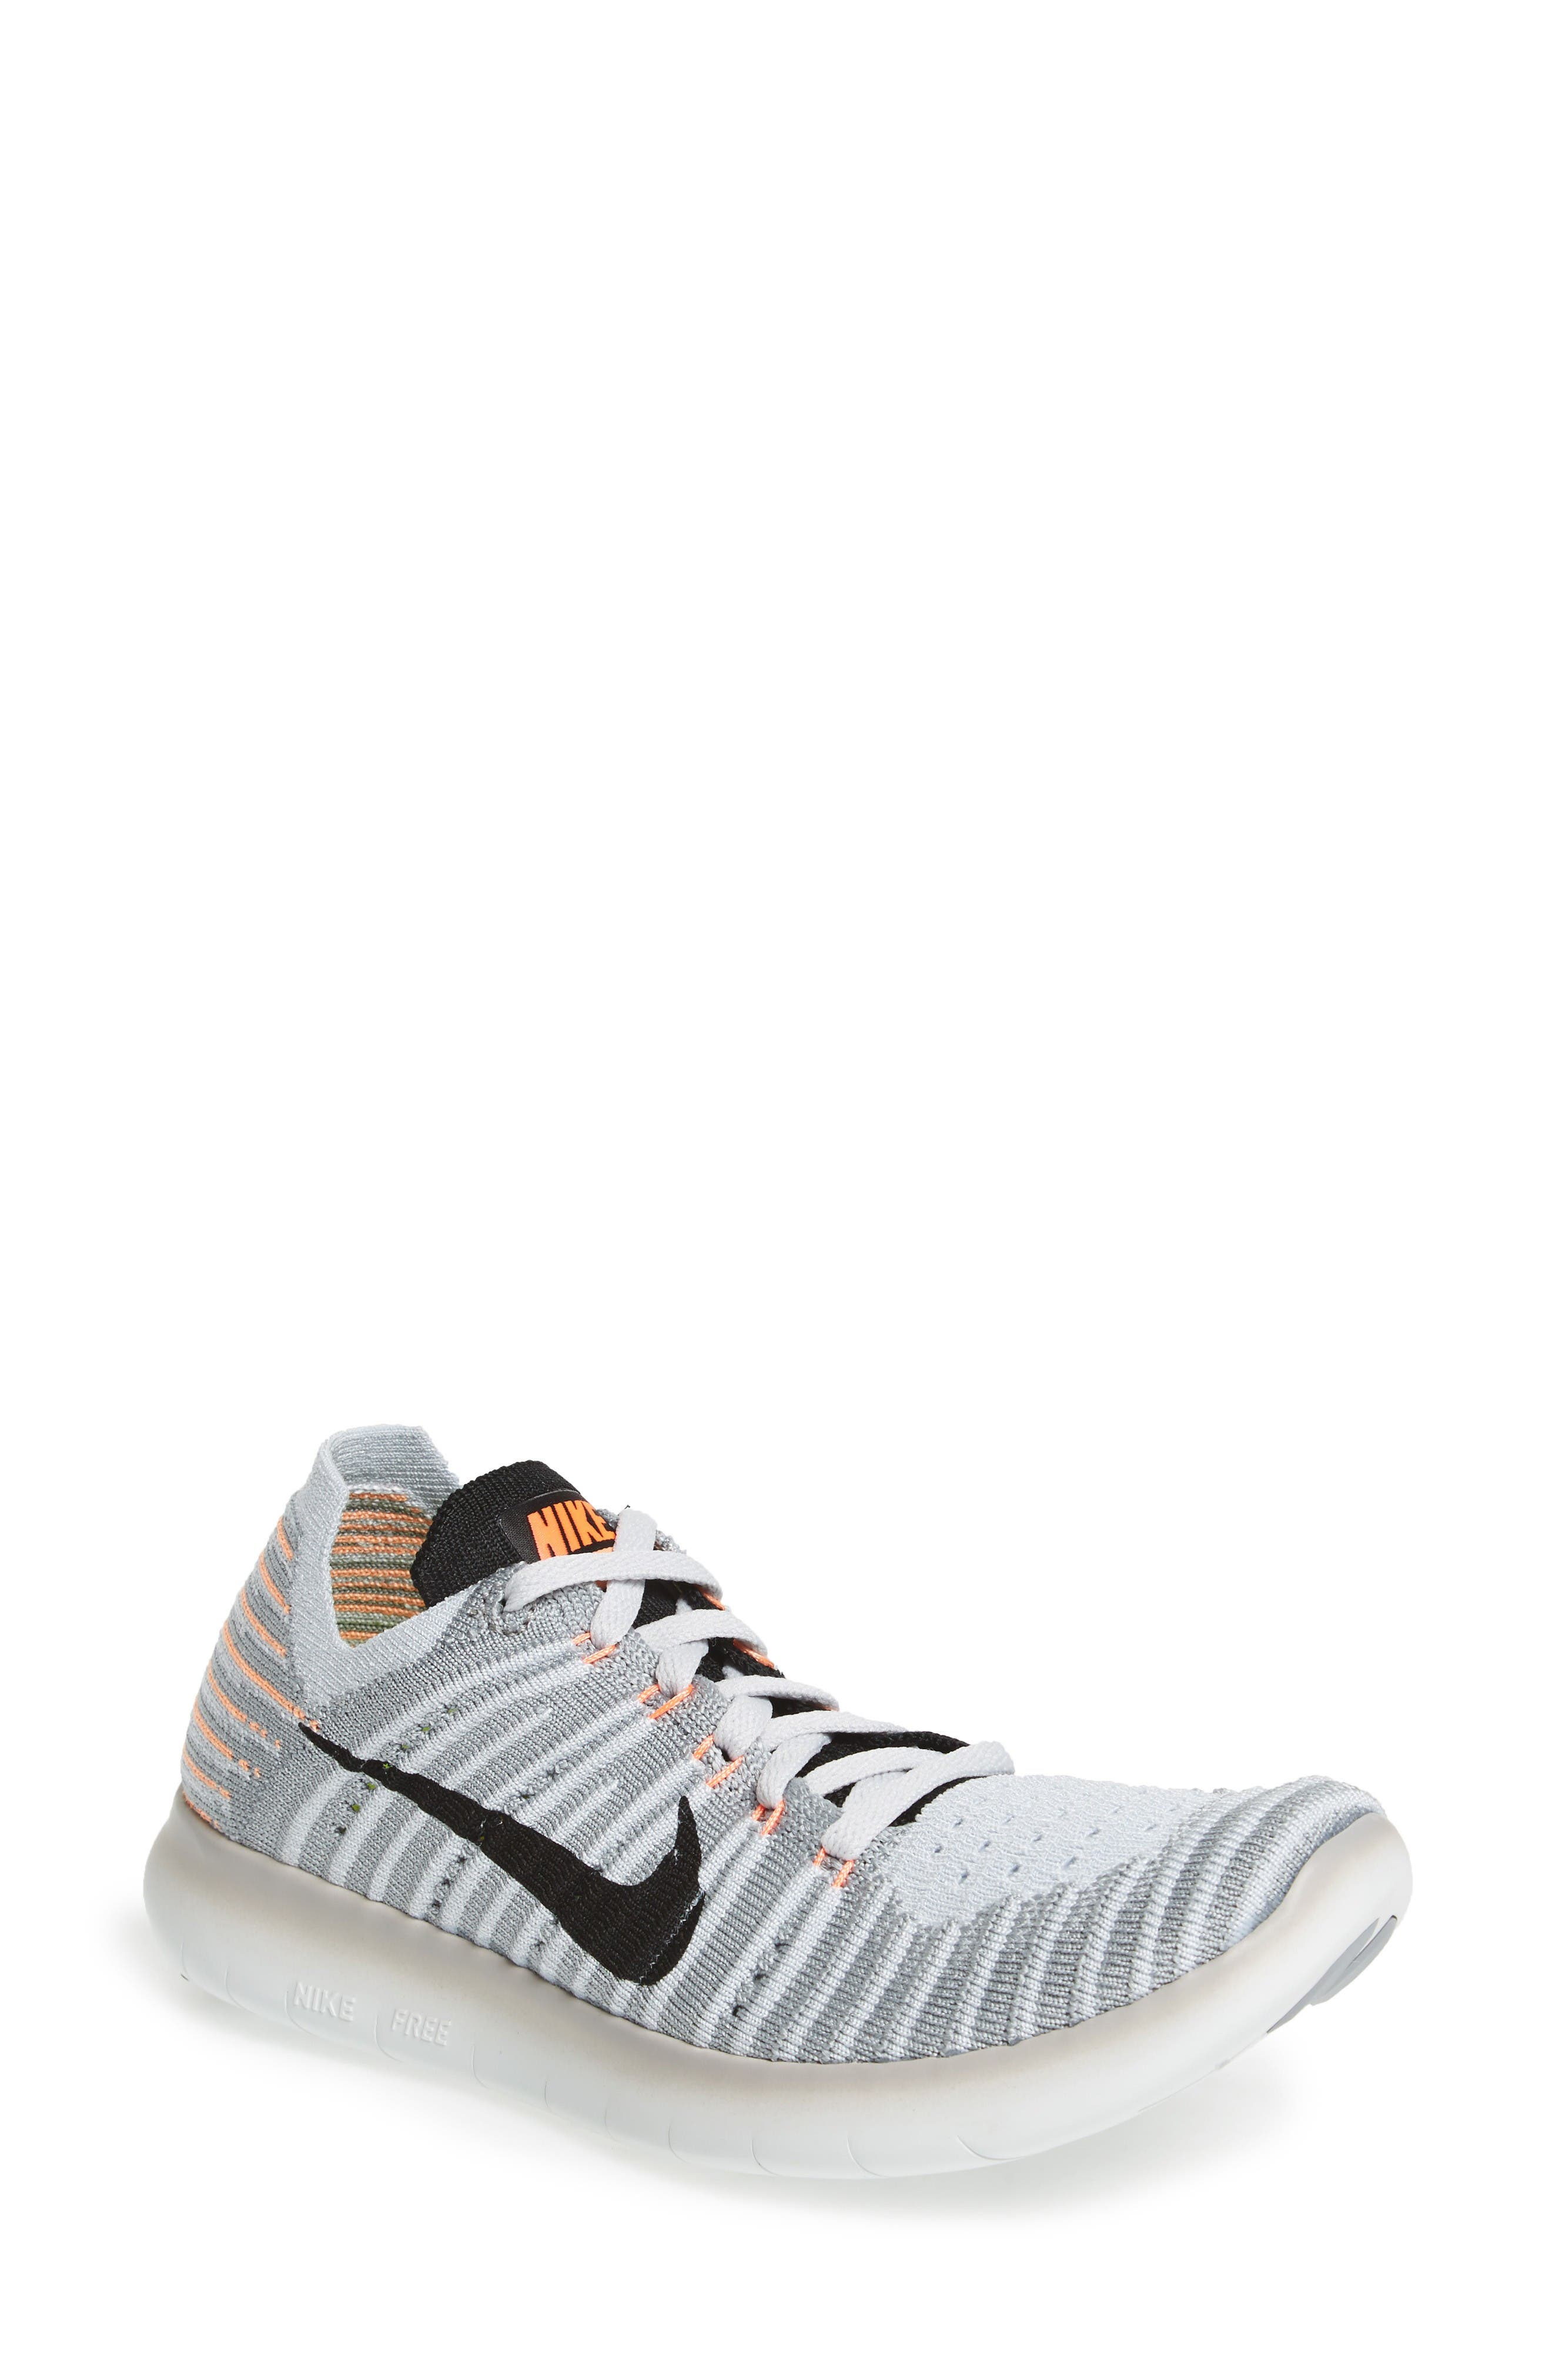 Main Image - Nike 'Free Flyknit' Running Shoe (Women)